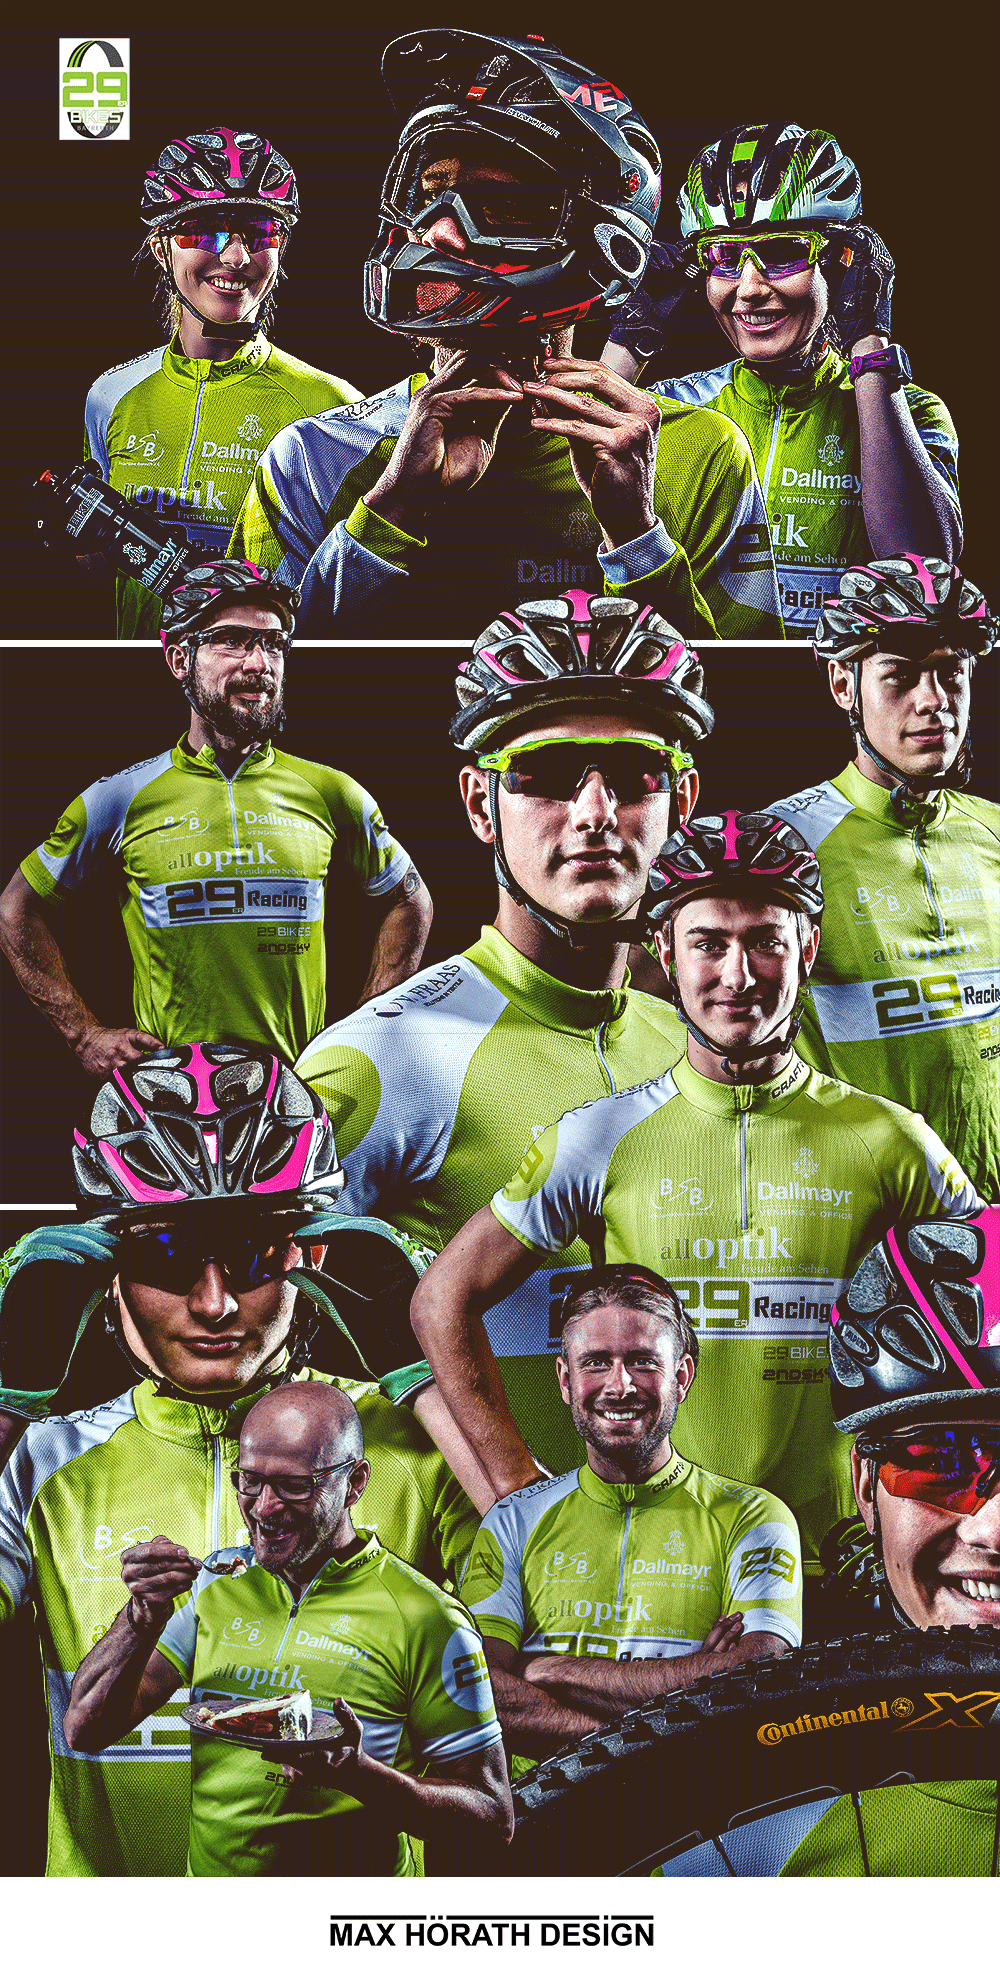 29er-mtb-team-sport-bayreuth-moutainbike-bmc-shop-laden-bike-enduro-kulmbach-bayreuth-nürnberg-fotograf-sportfotograf-max-hoerath-design-werbefotograf-fahrrad-niner